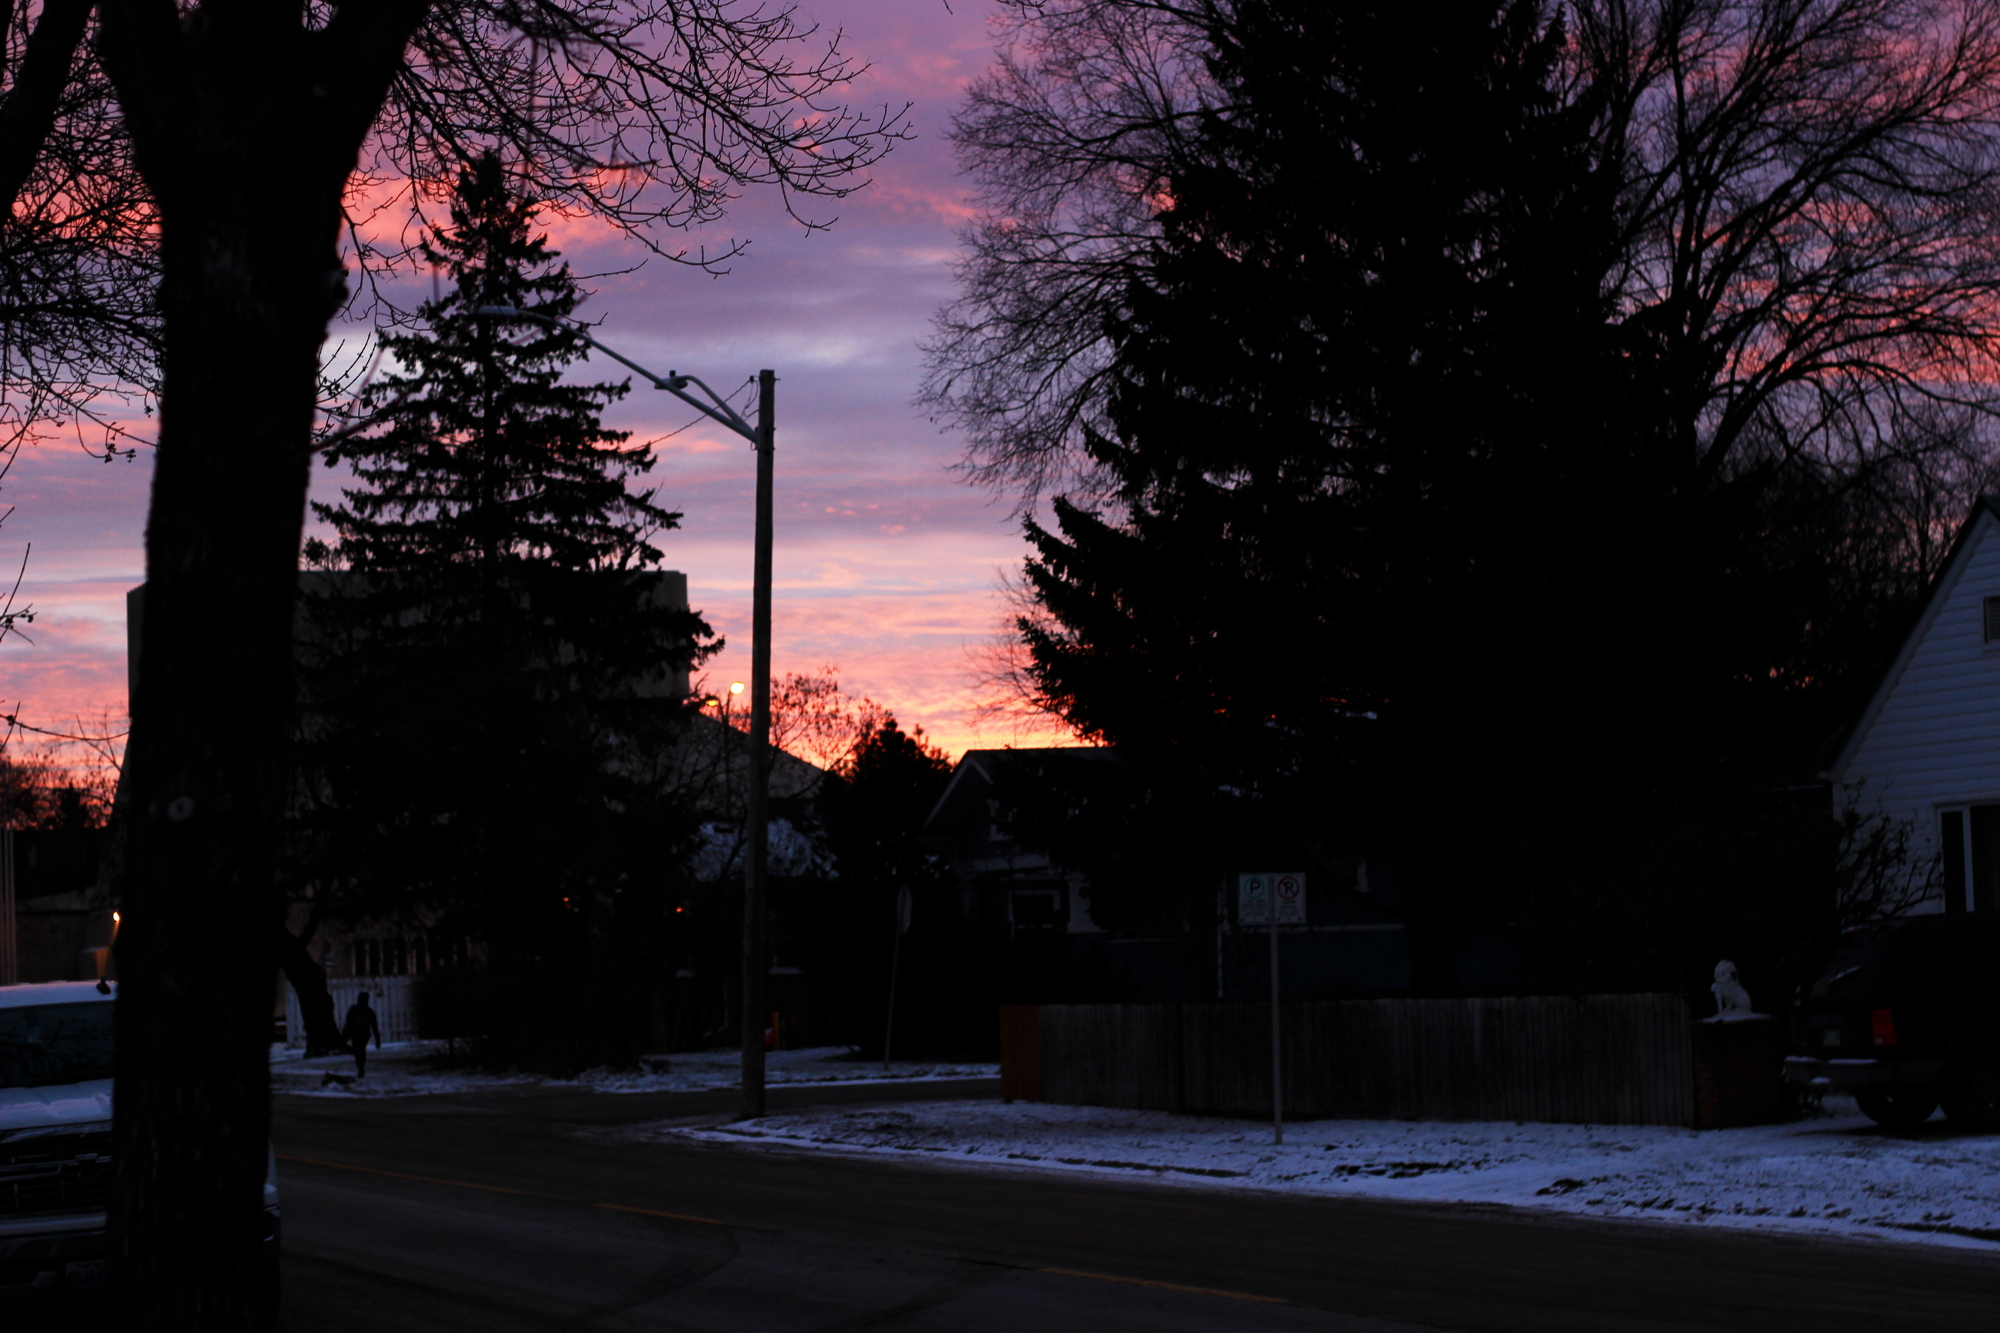 Sunrise on Hallowe'en